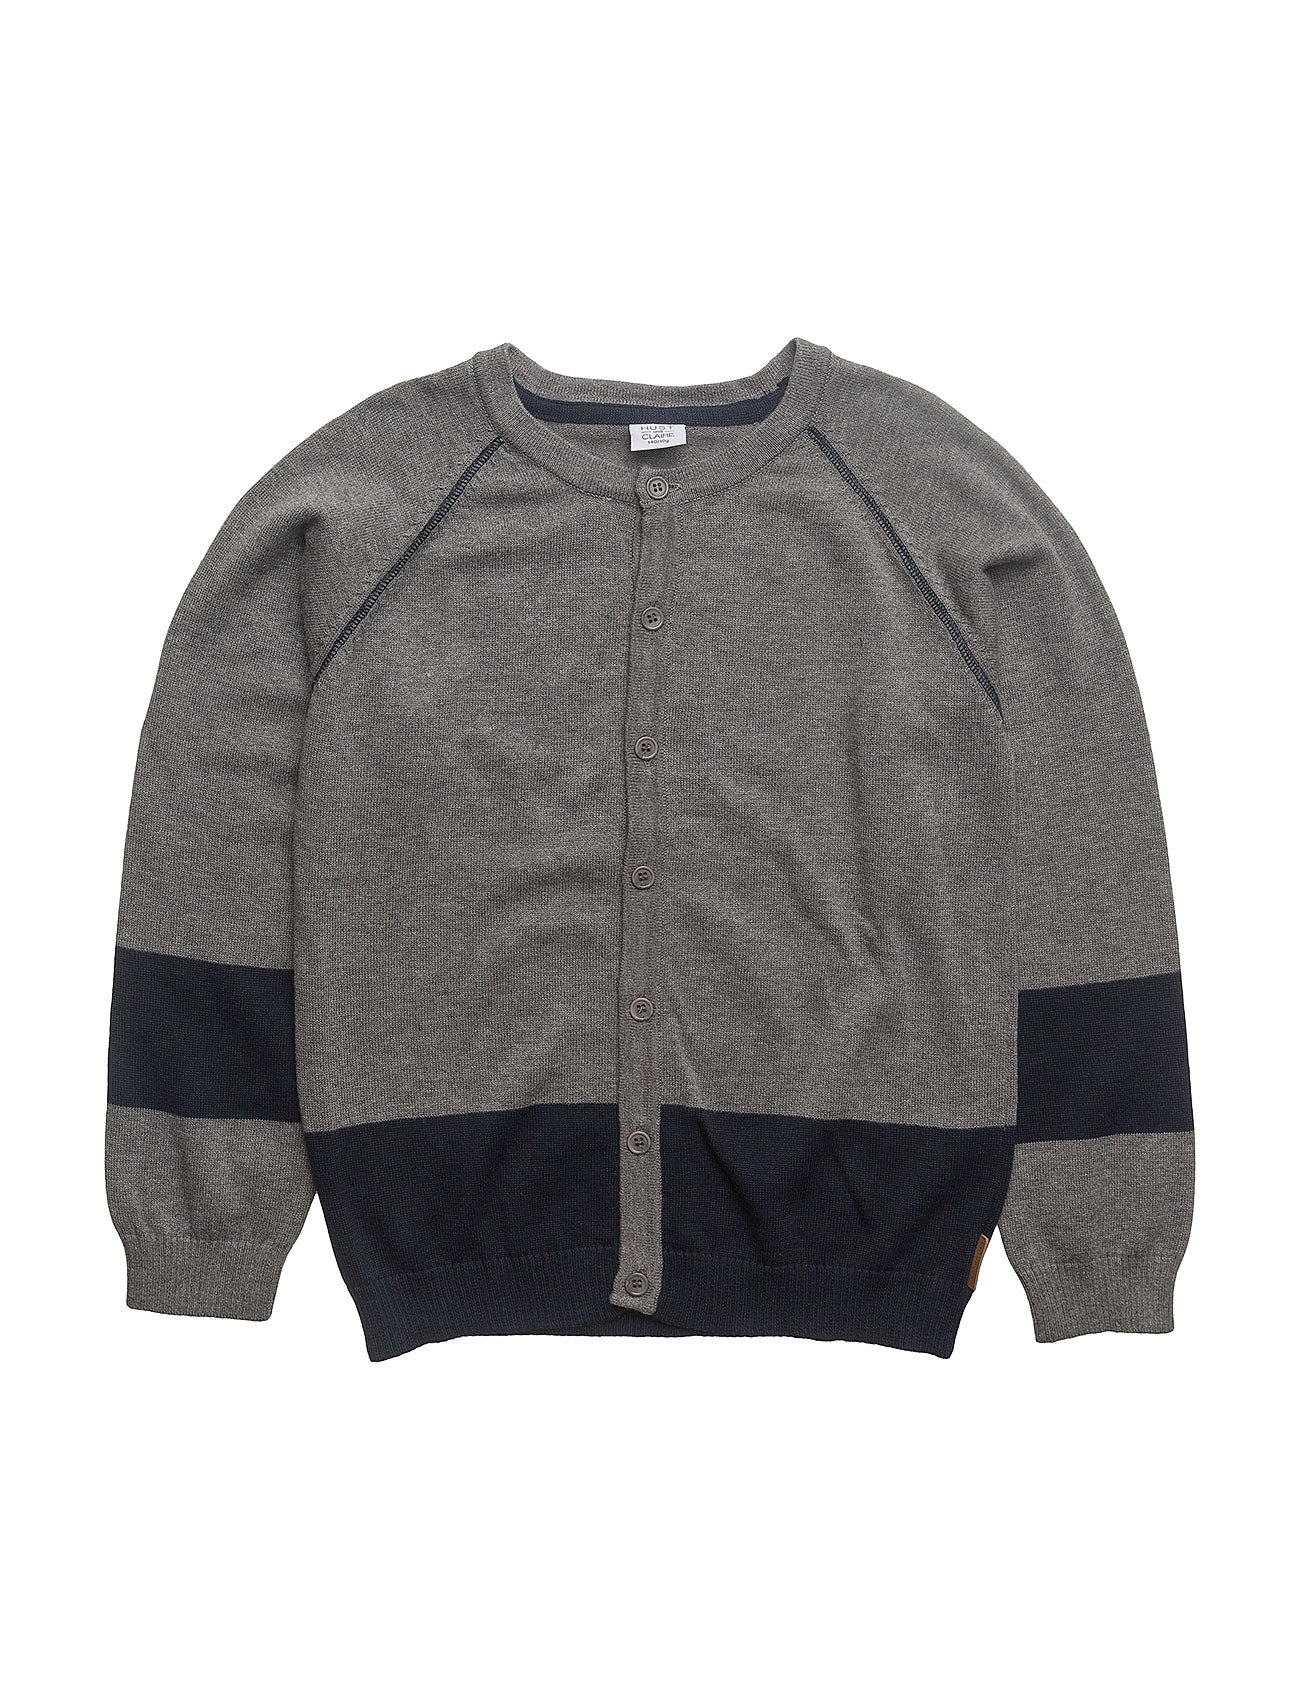 Cardigan (Wool Grey) (£21.69) - Hust & Claire   Boozt.com